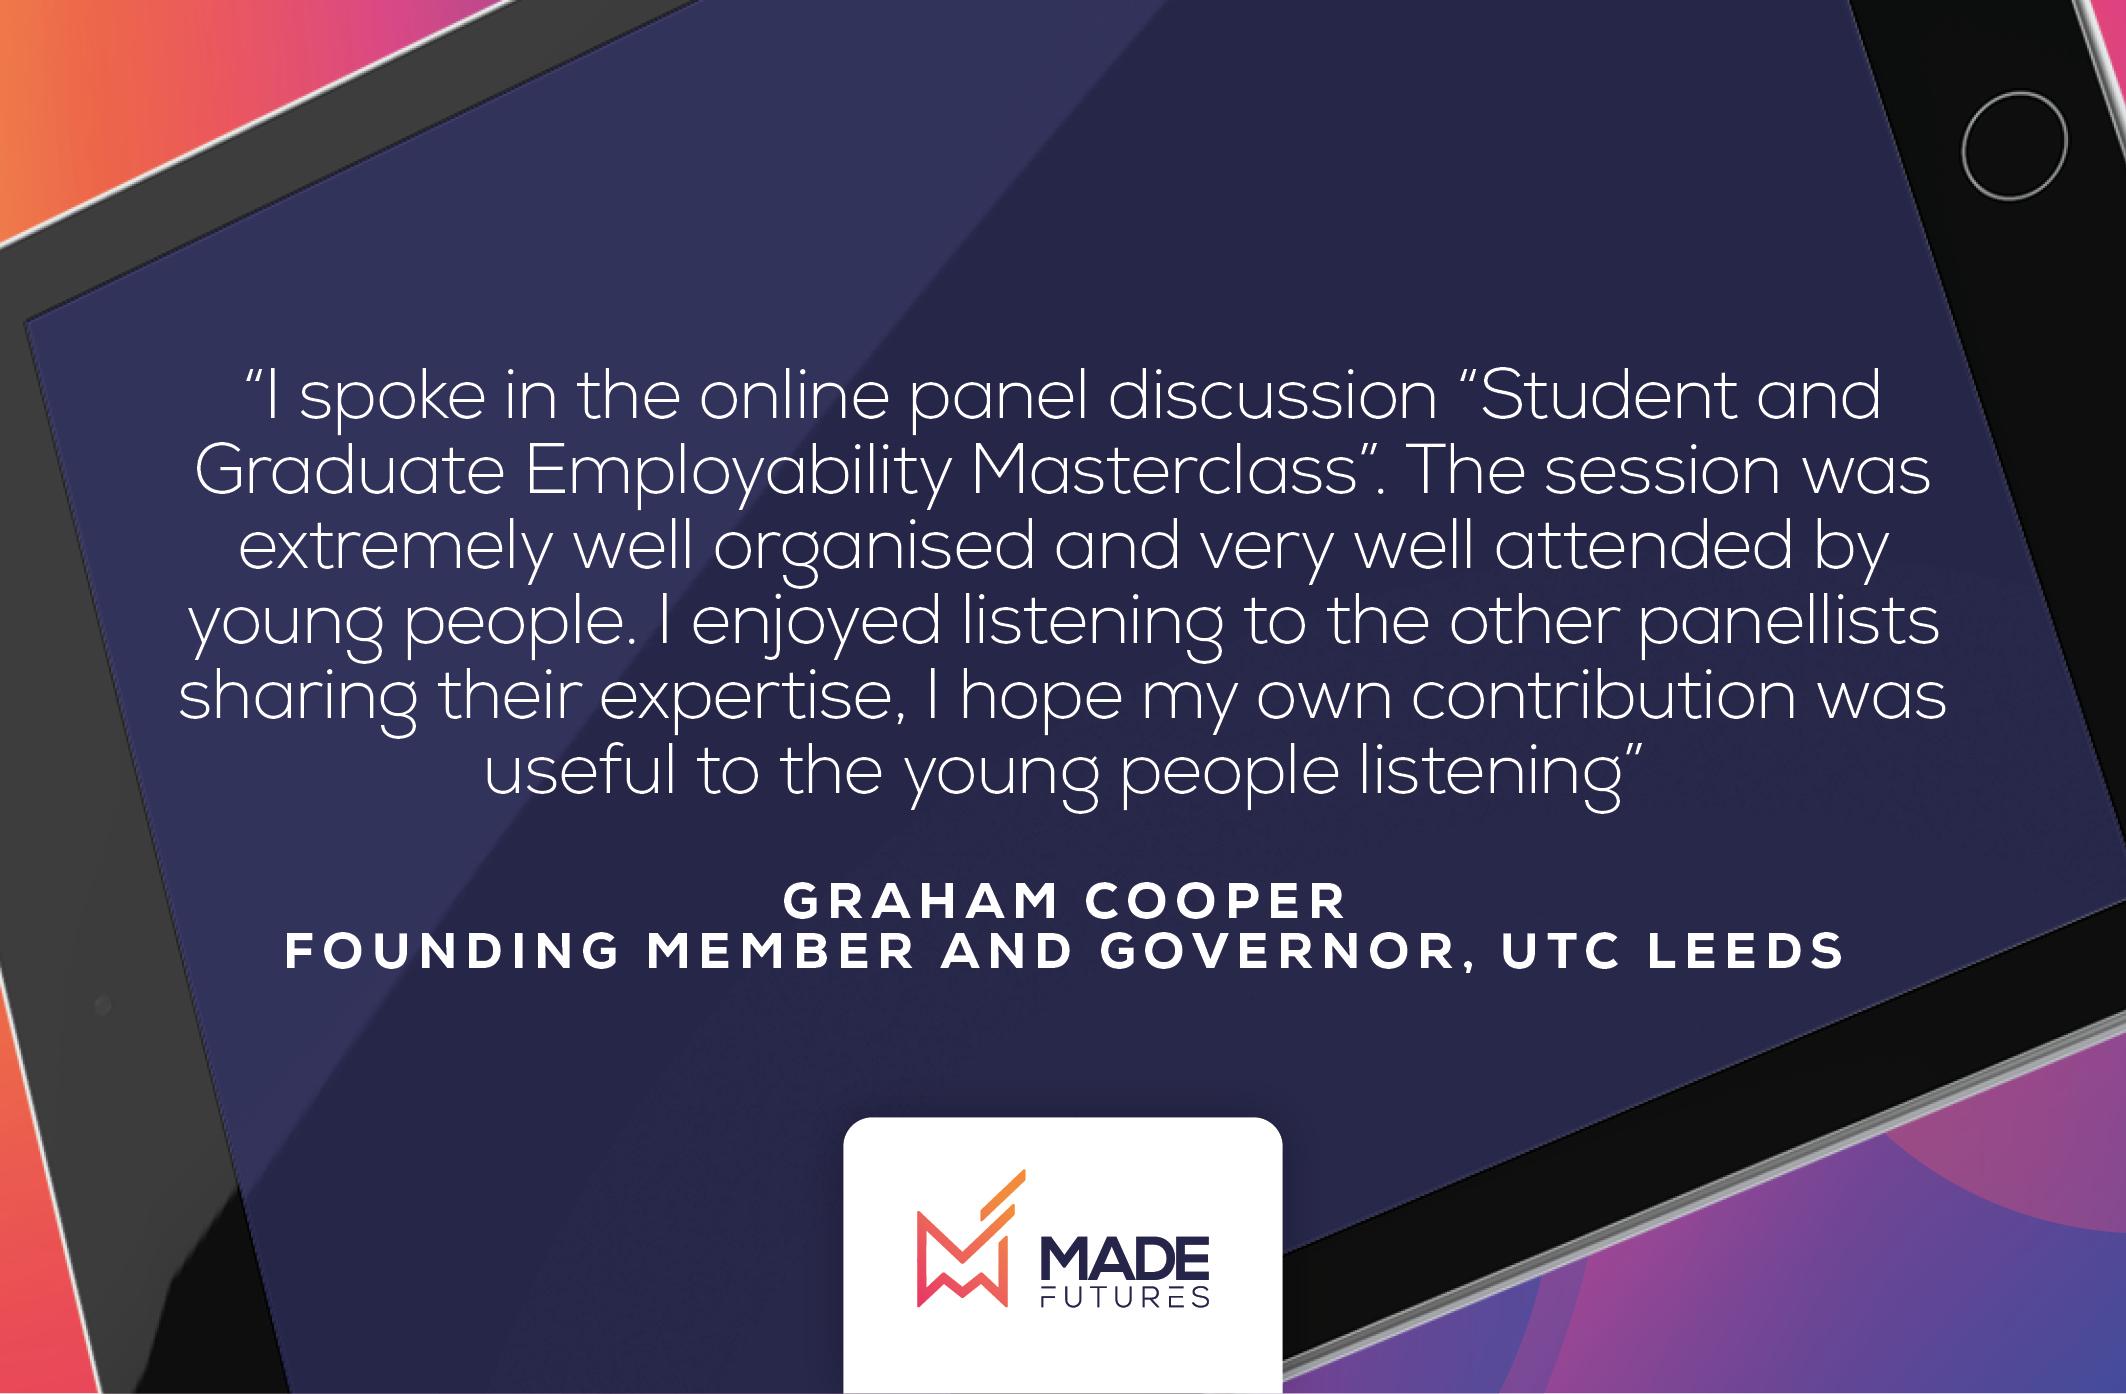 Testimonial by Graham Cooper, Founding member and governer at UTC Leeds